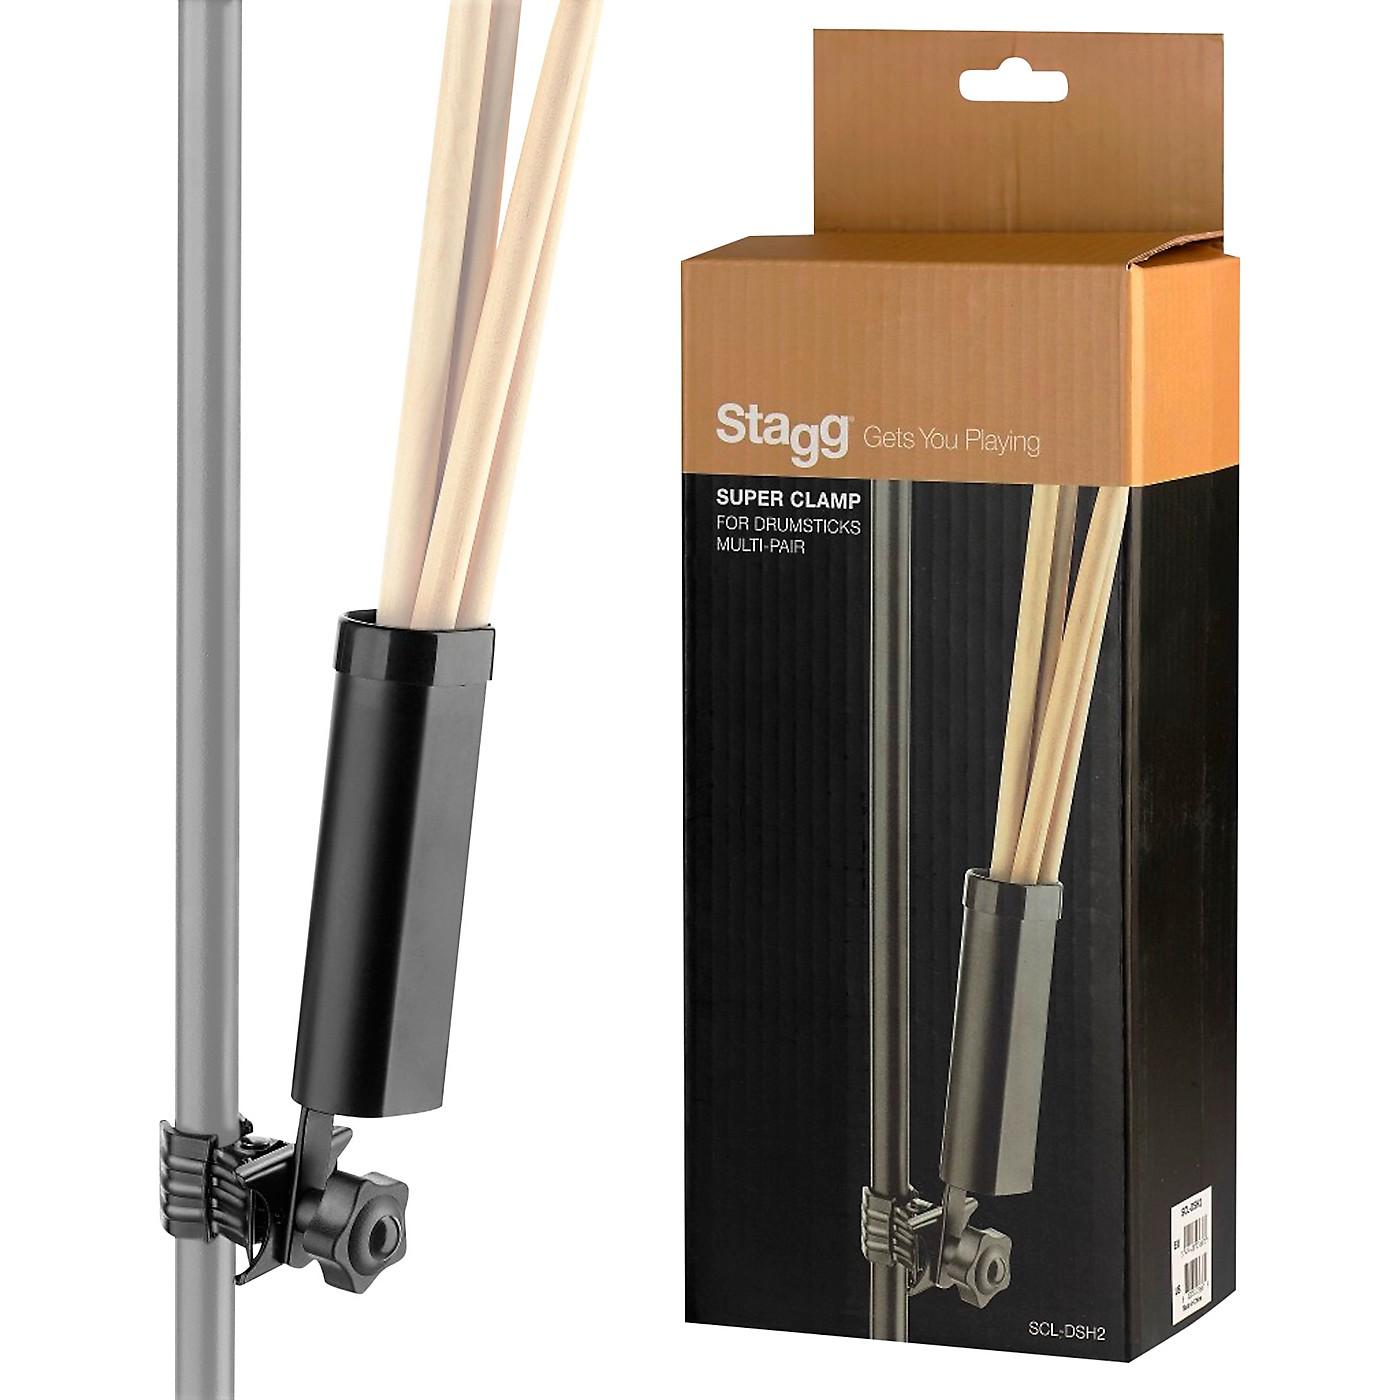 Stagg Super Clamp Multi-Pair Drum Stick Holder thumbnail